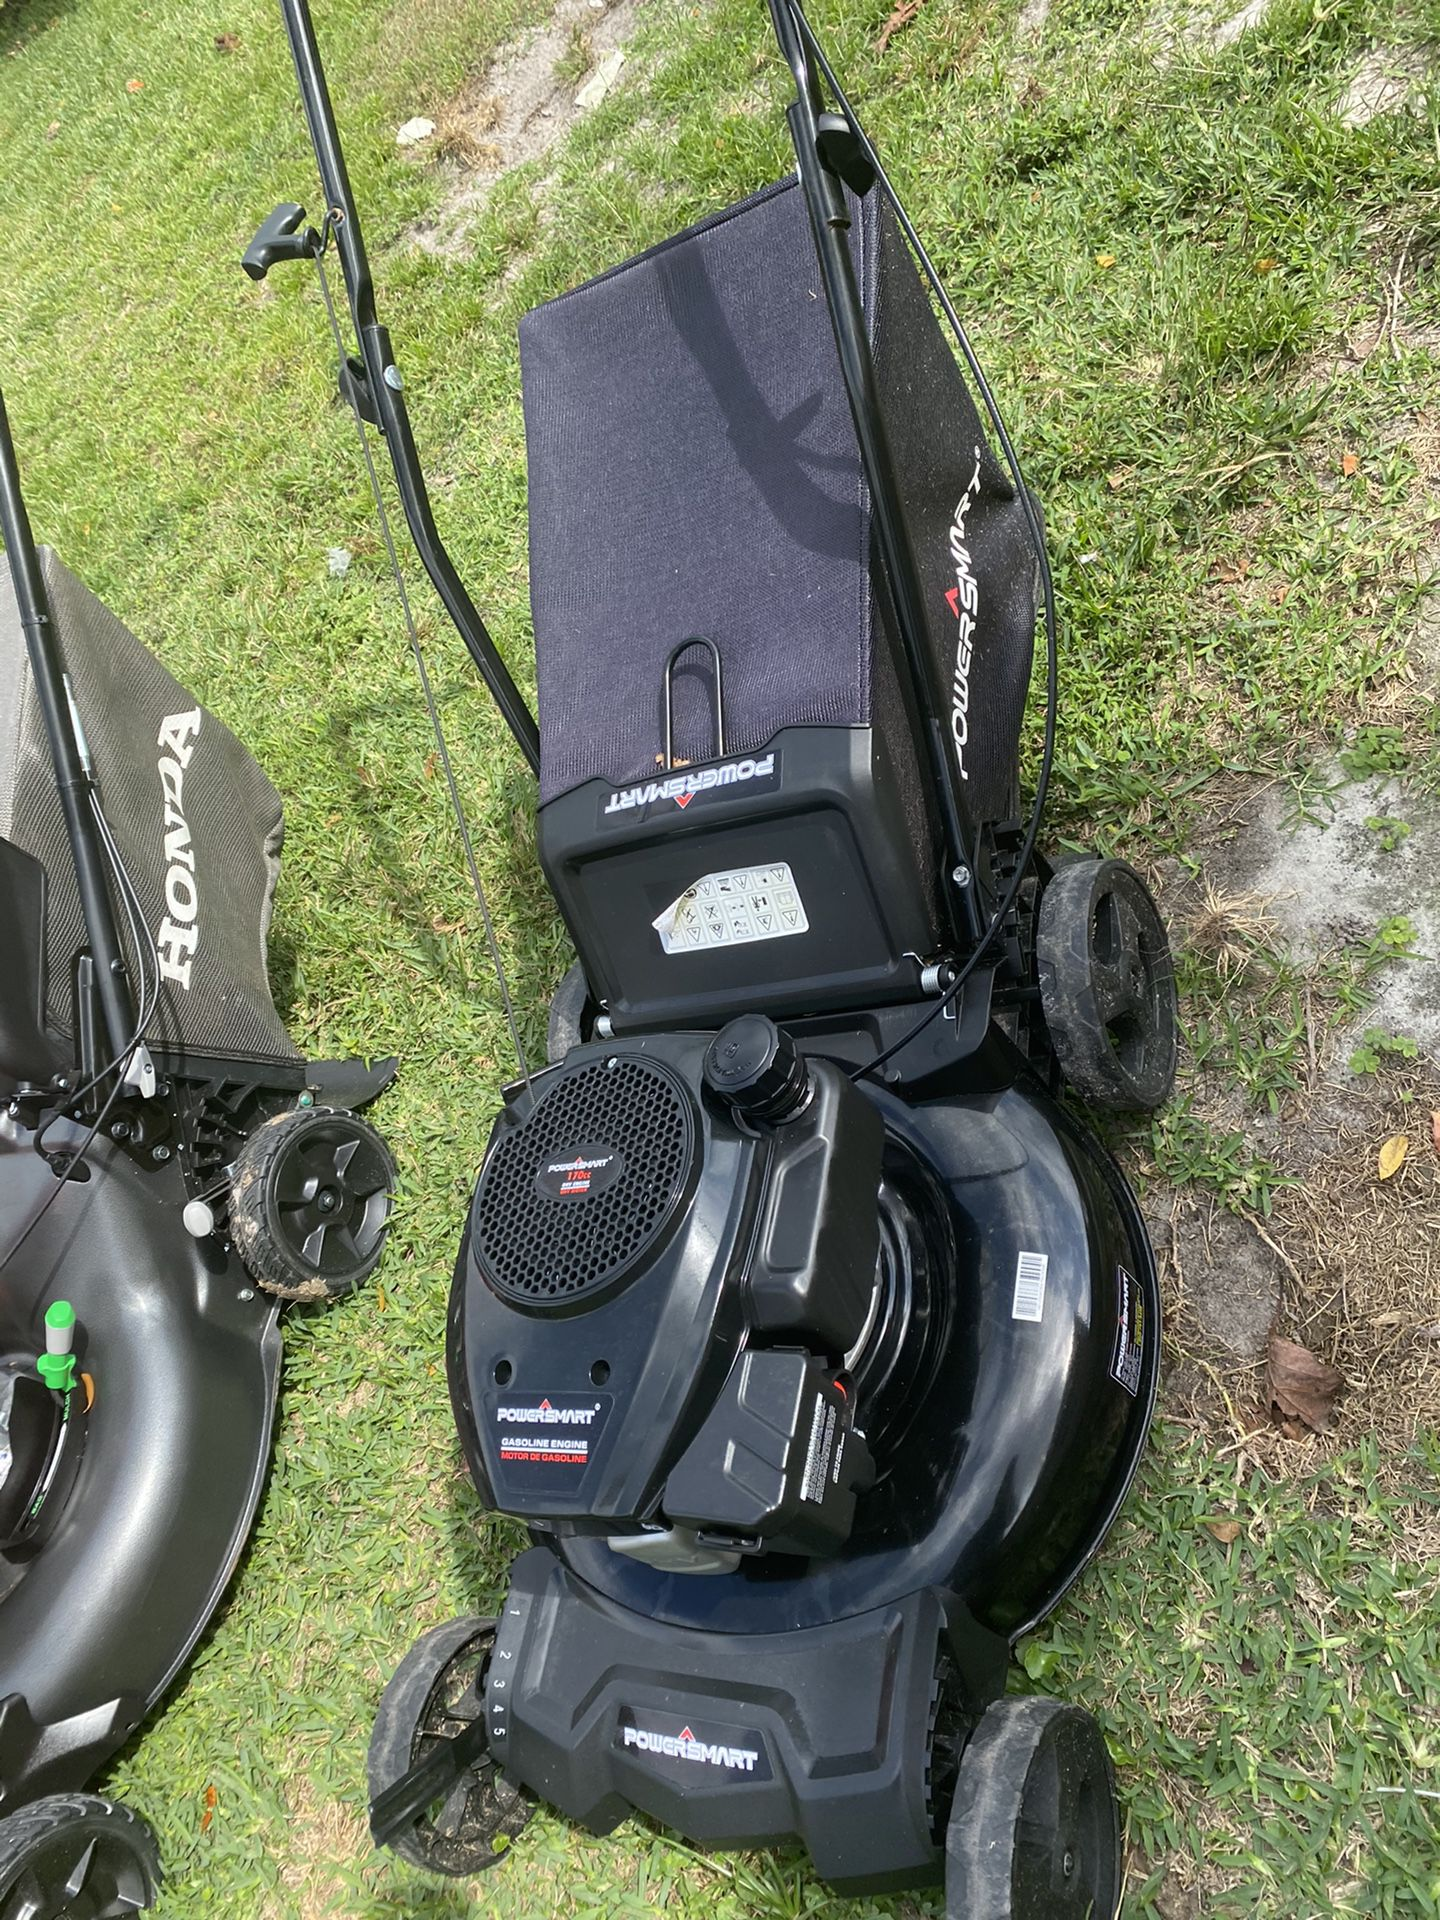 Power Smart Lawndmower